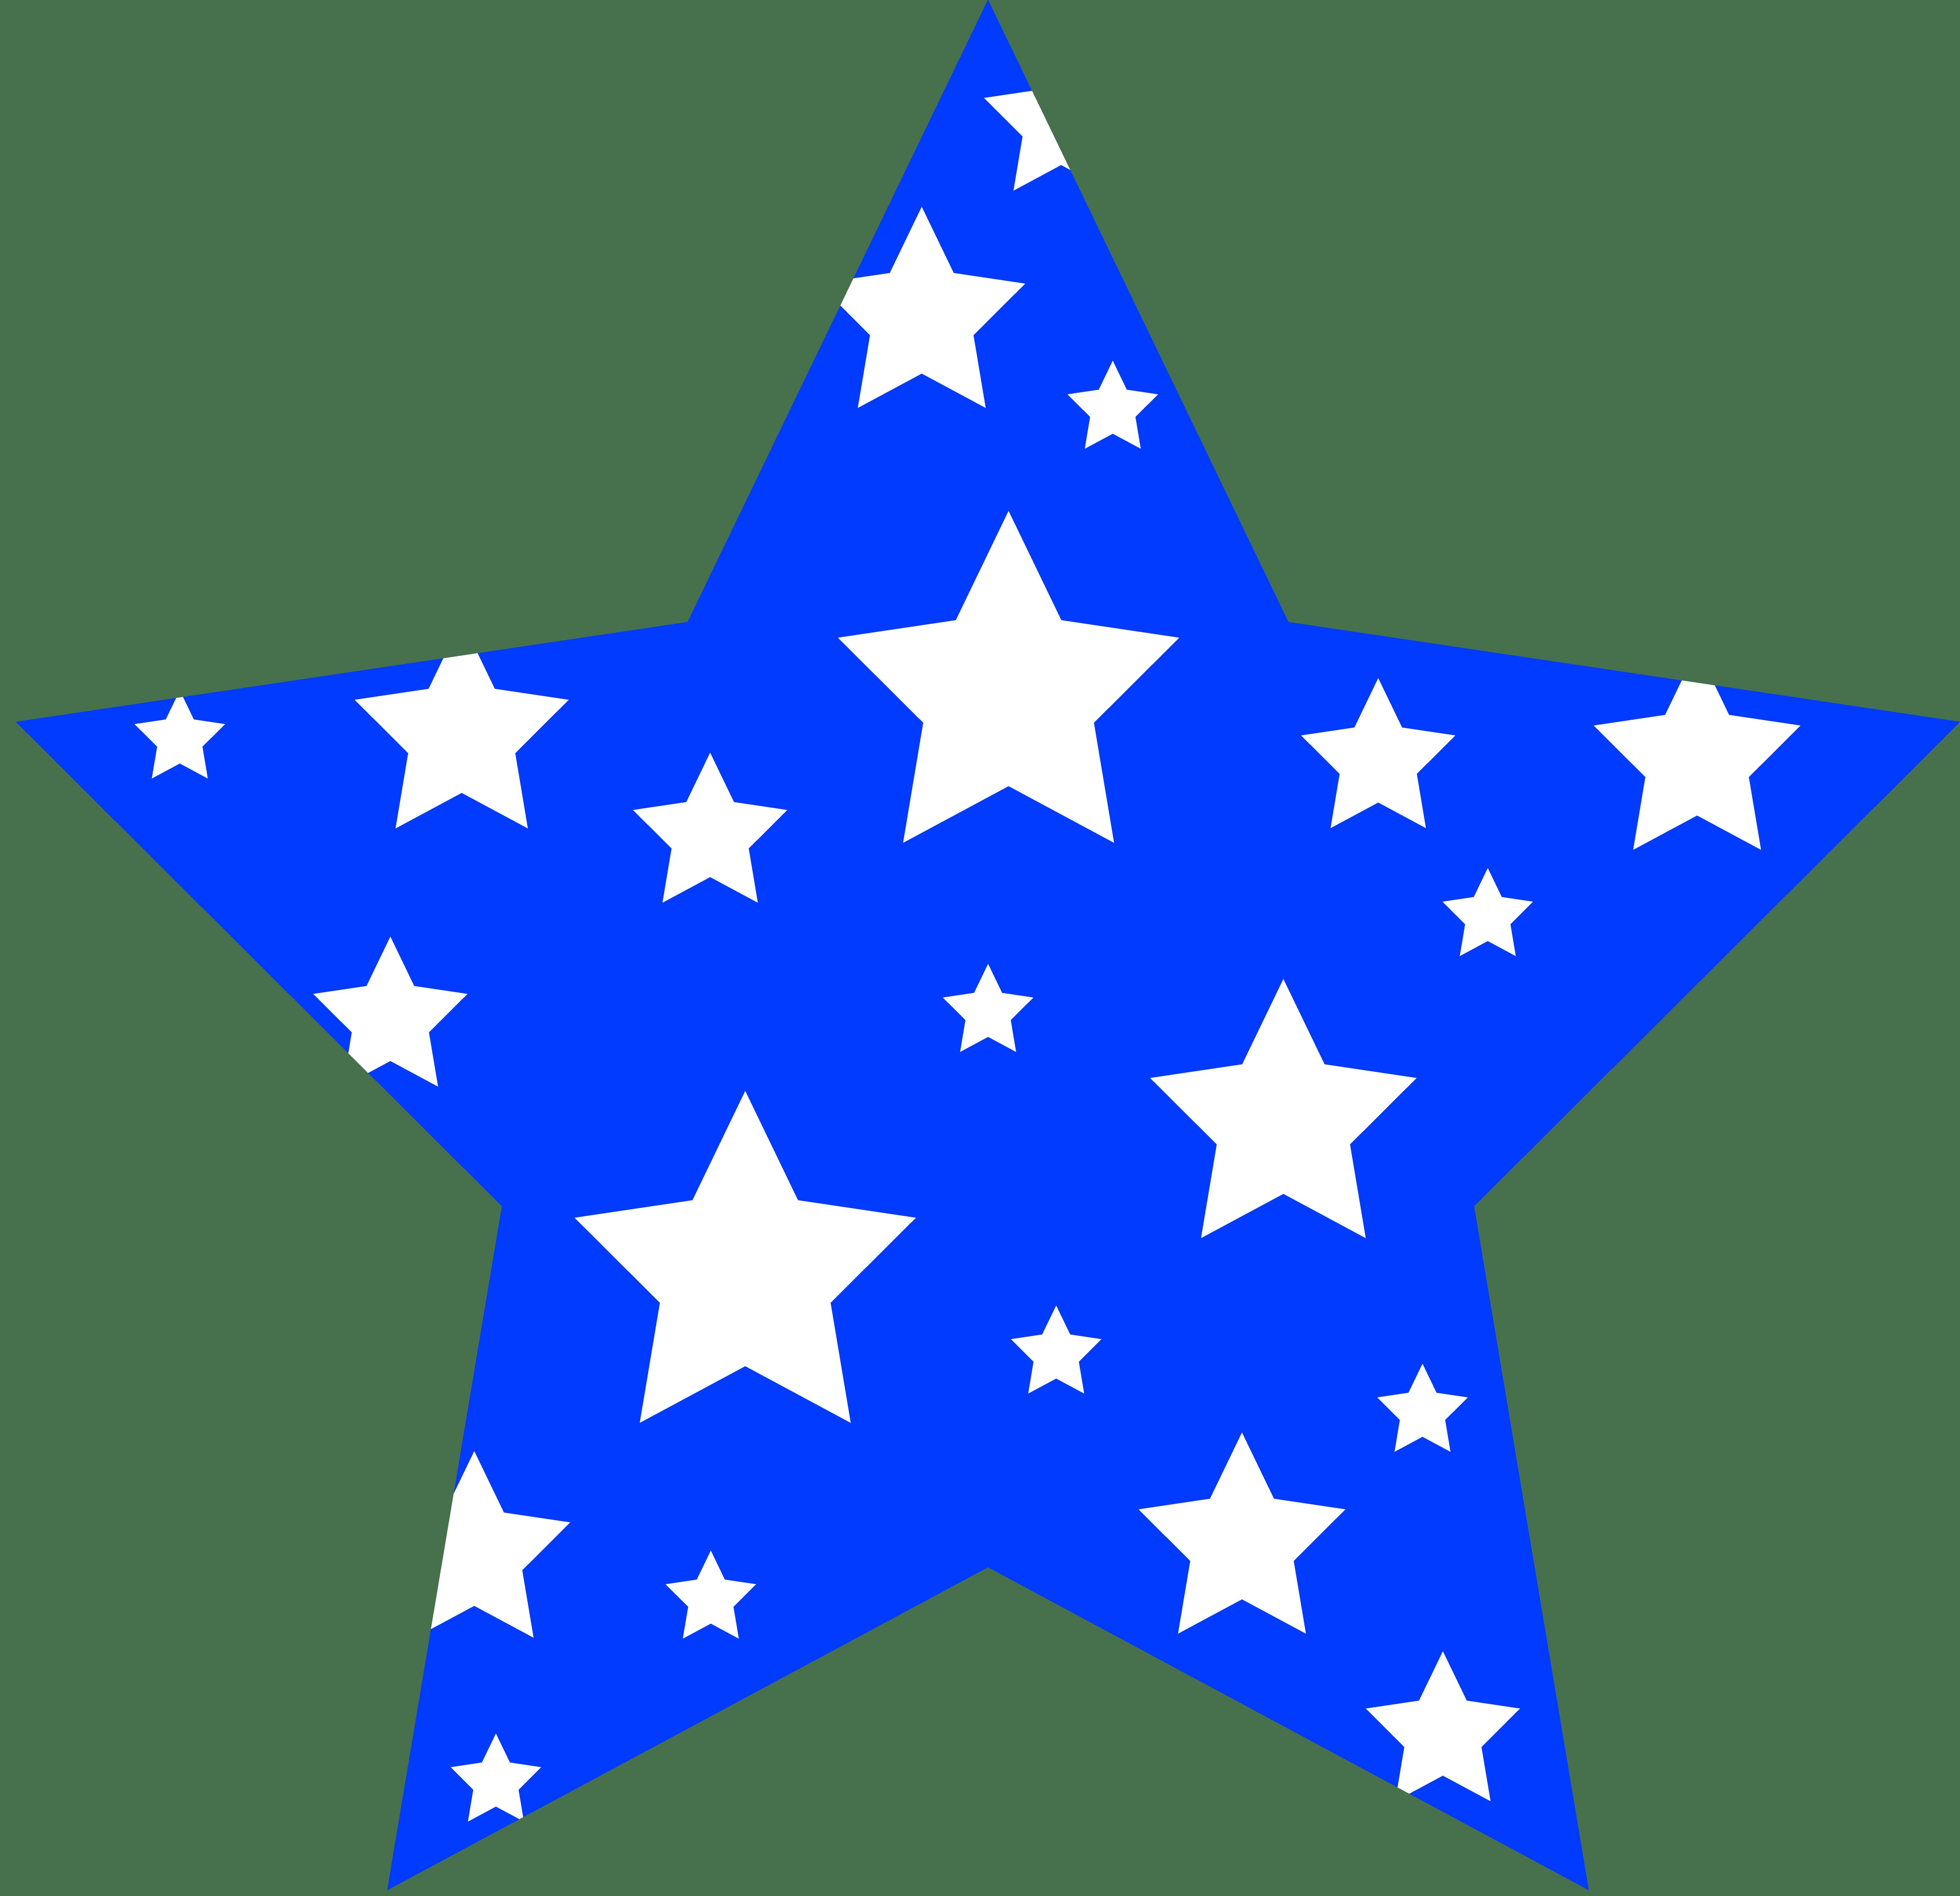 Microsoft clipart stars 7 » Clipart Portal.